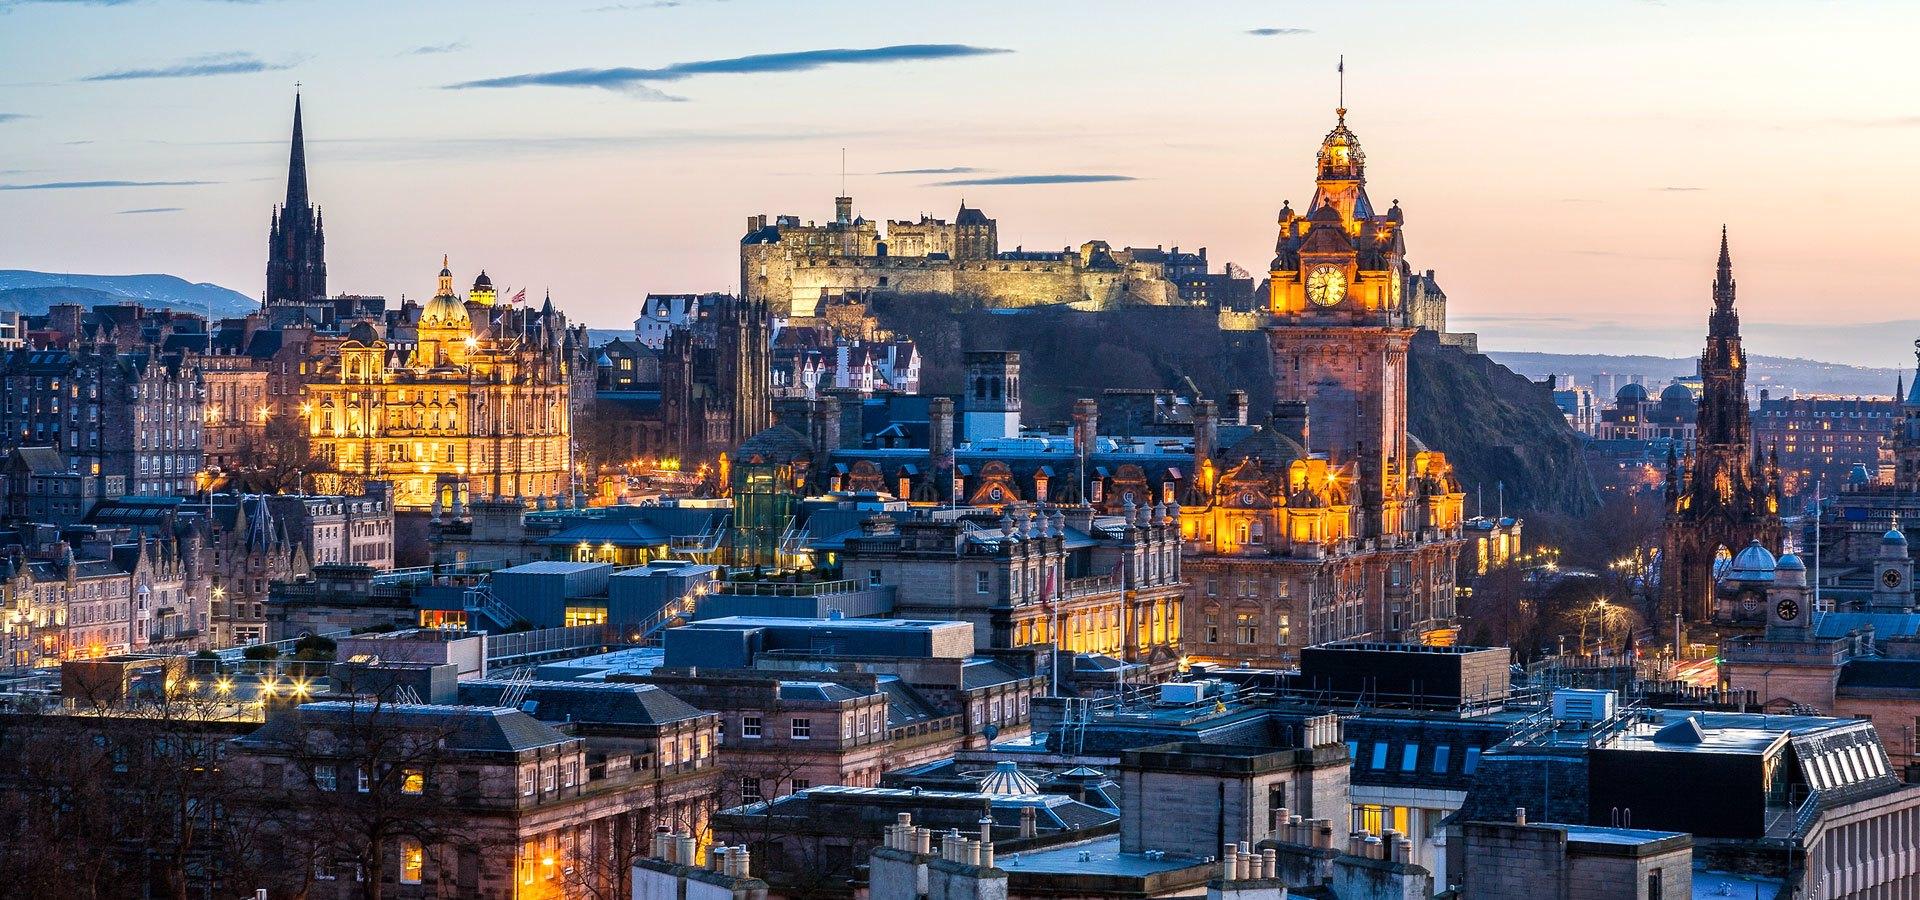 Edimburgo, cosa visitare?